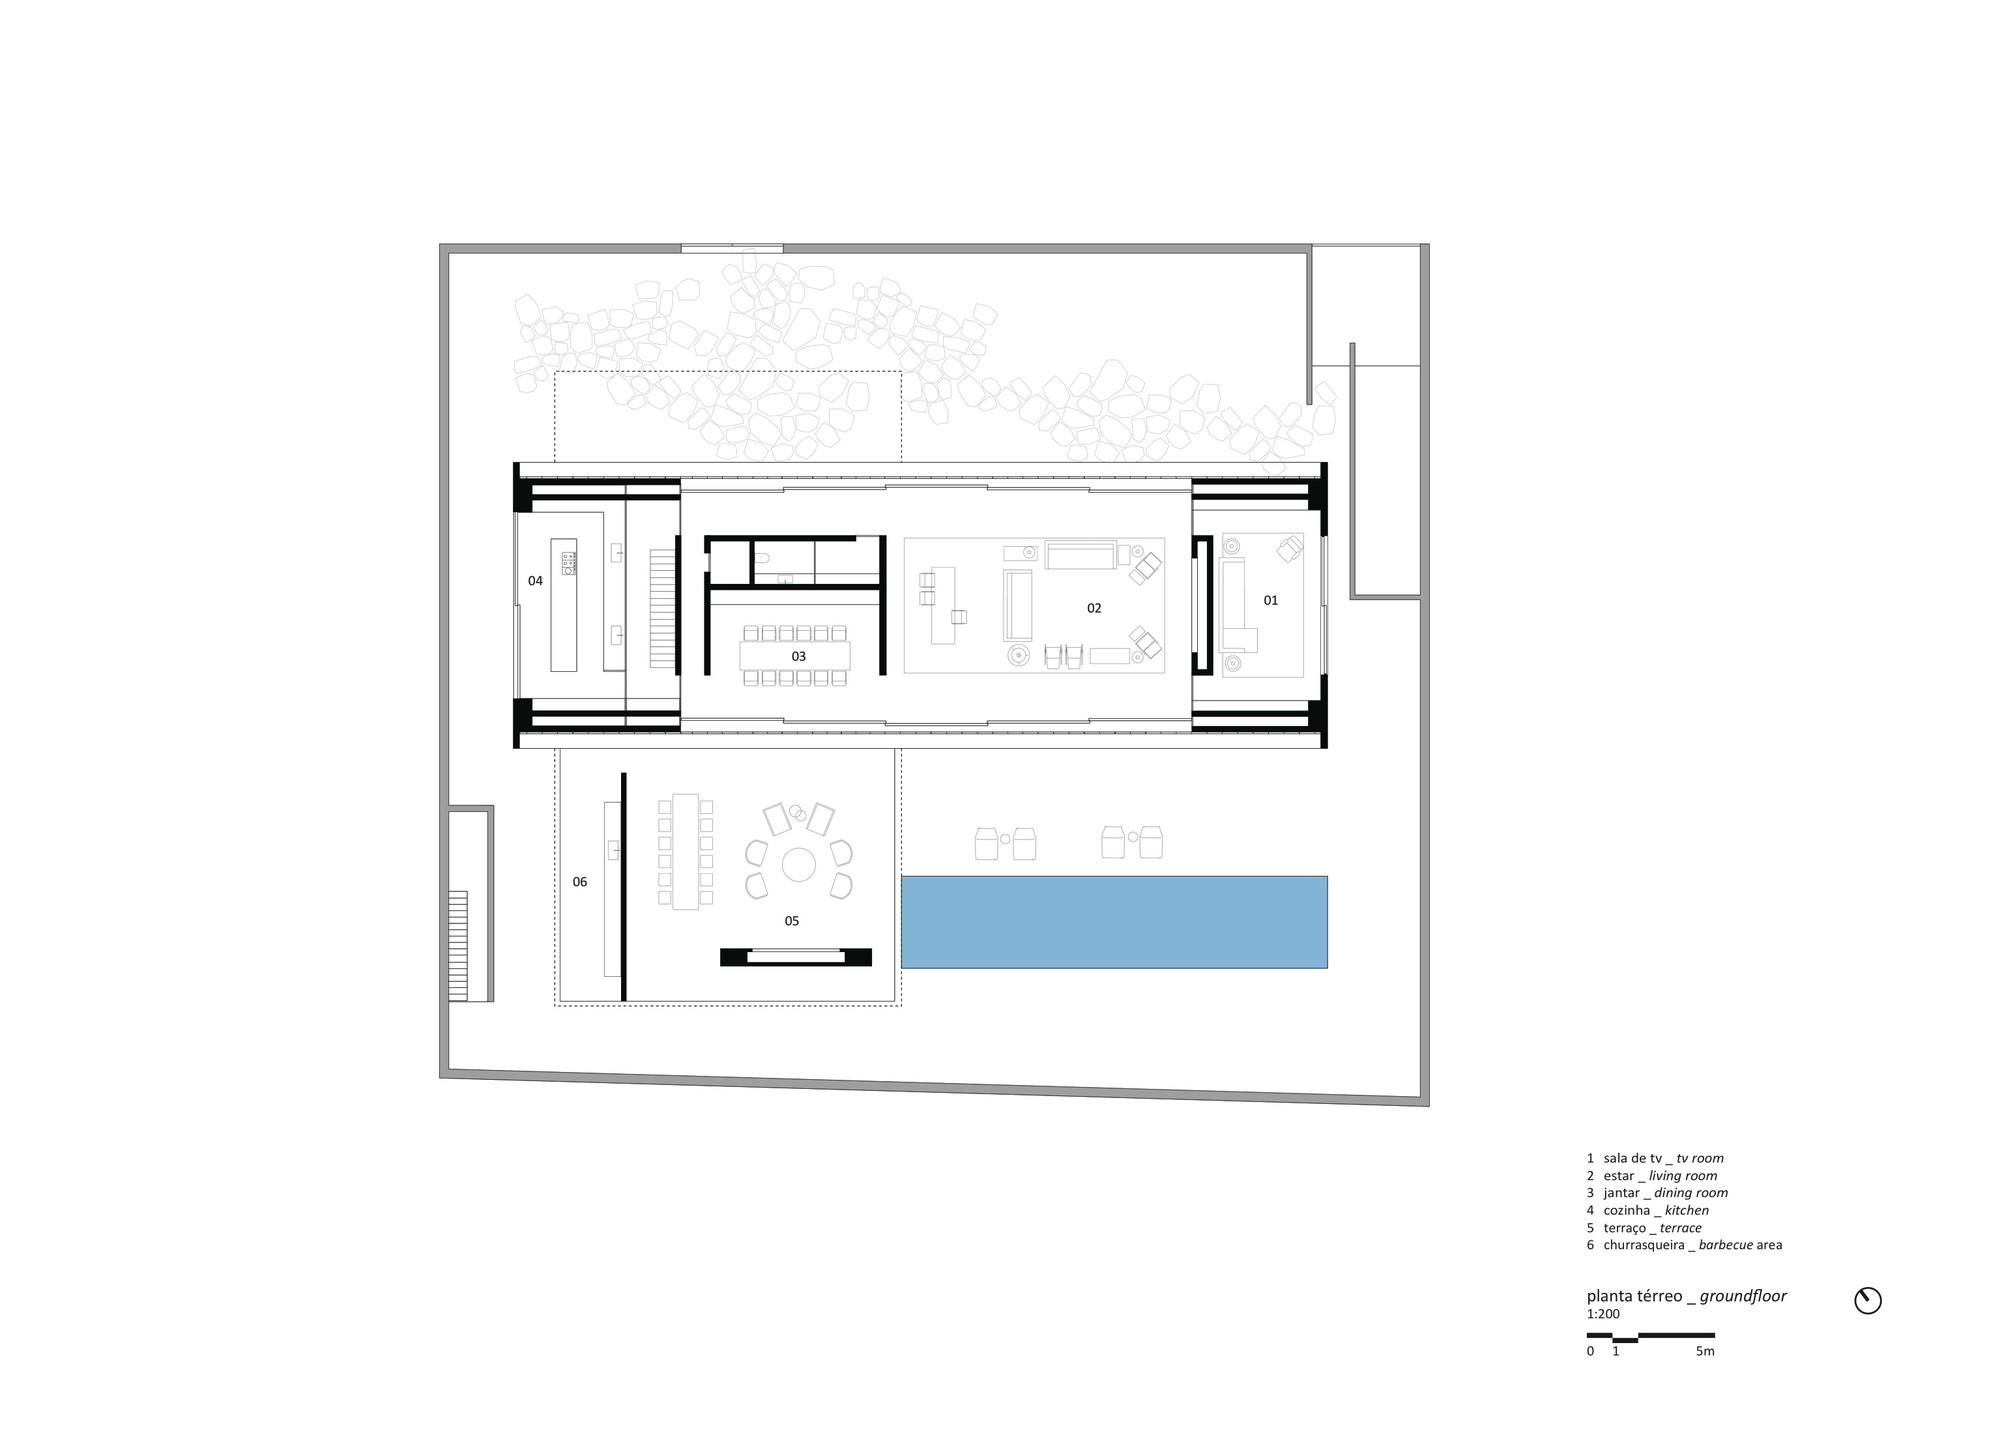 Gallery of the p house studio mk27 marcio kogan lair for Marcio kogan plans